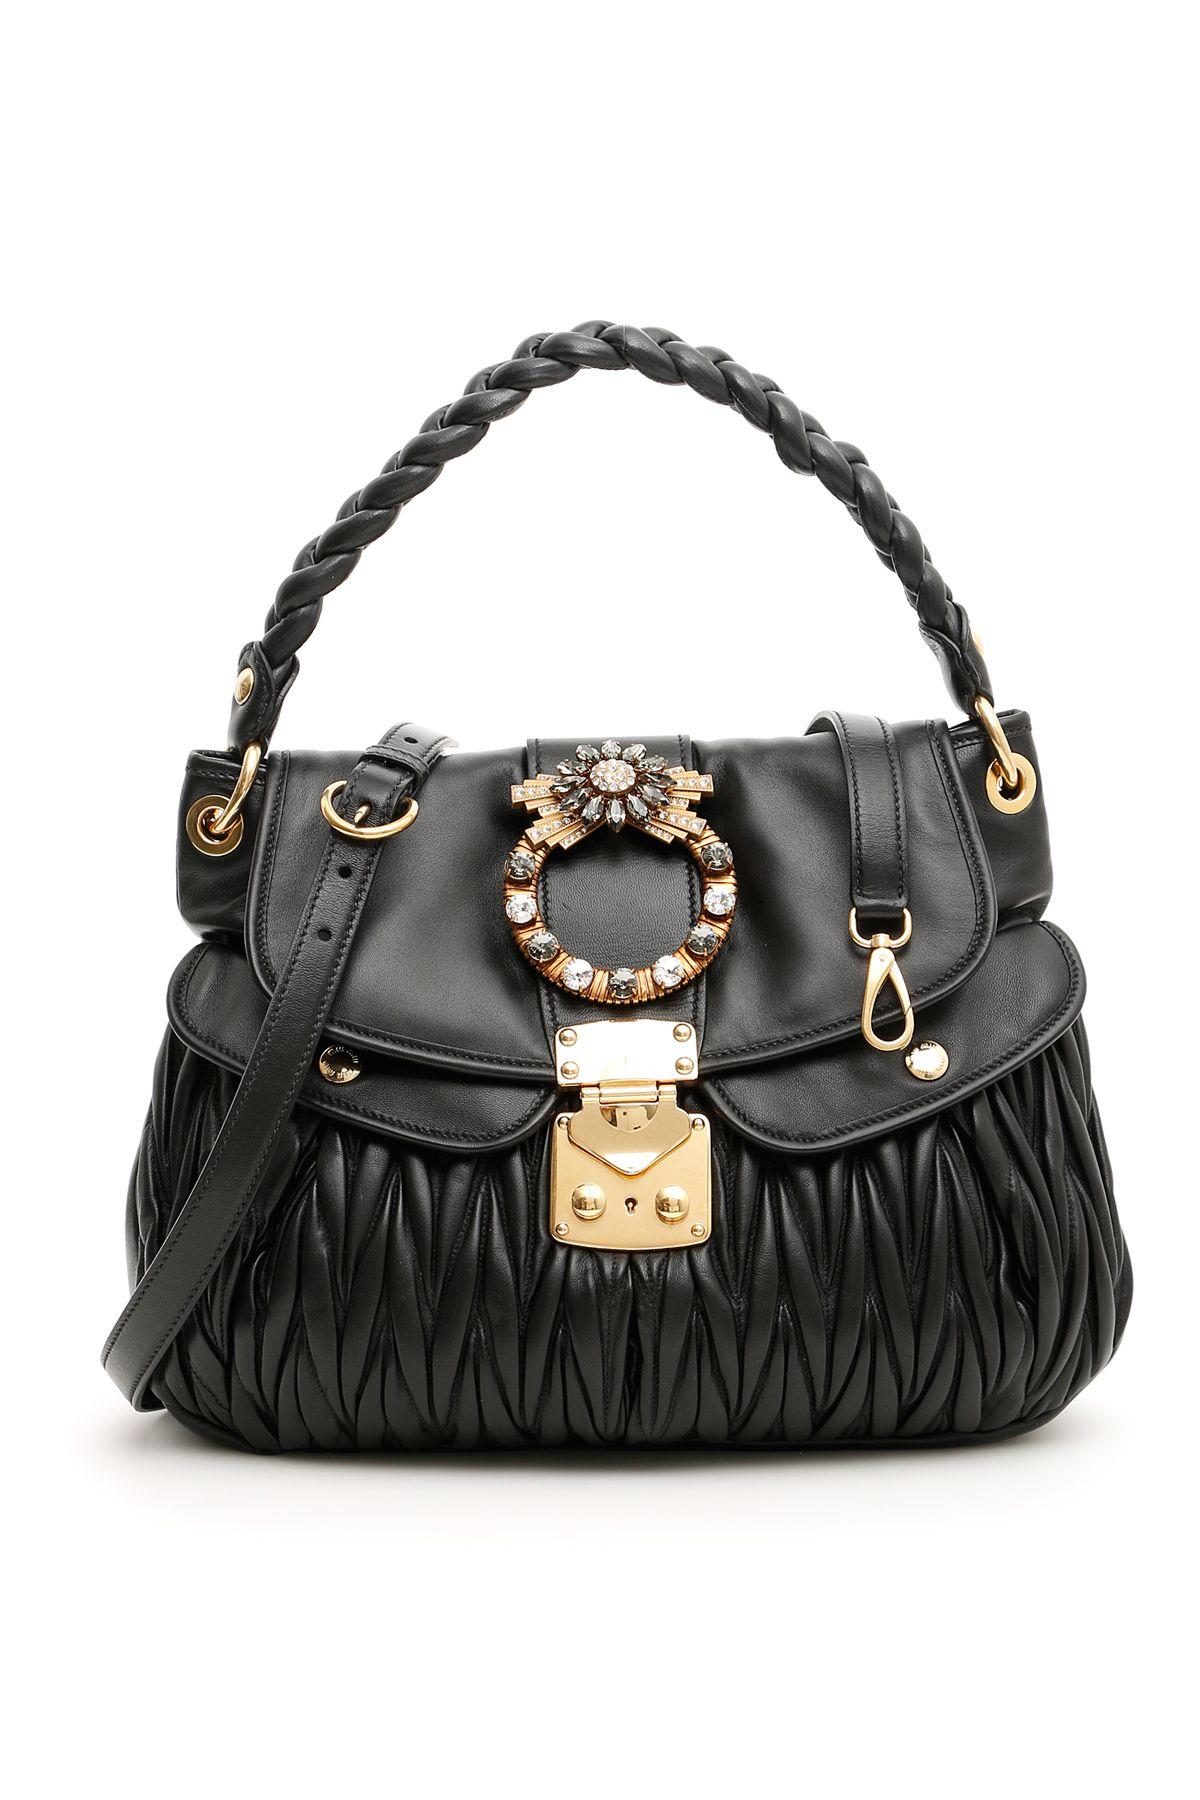 Miu Miu Miu Miu Crystal Buckle Coffer Bag - NERO 931d72f78cd2c